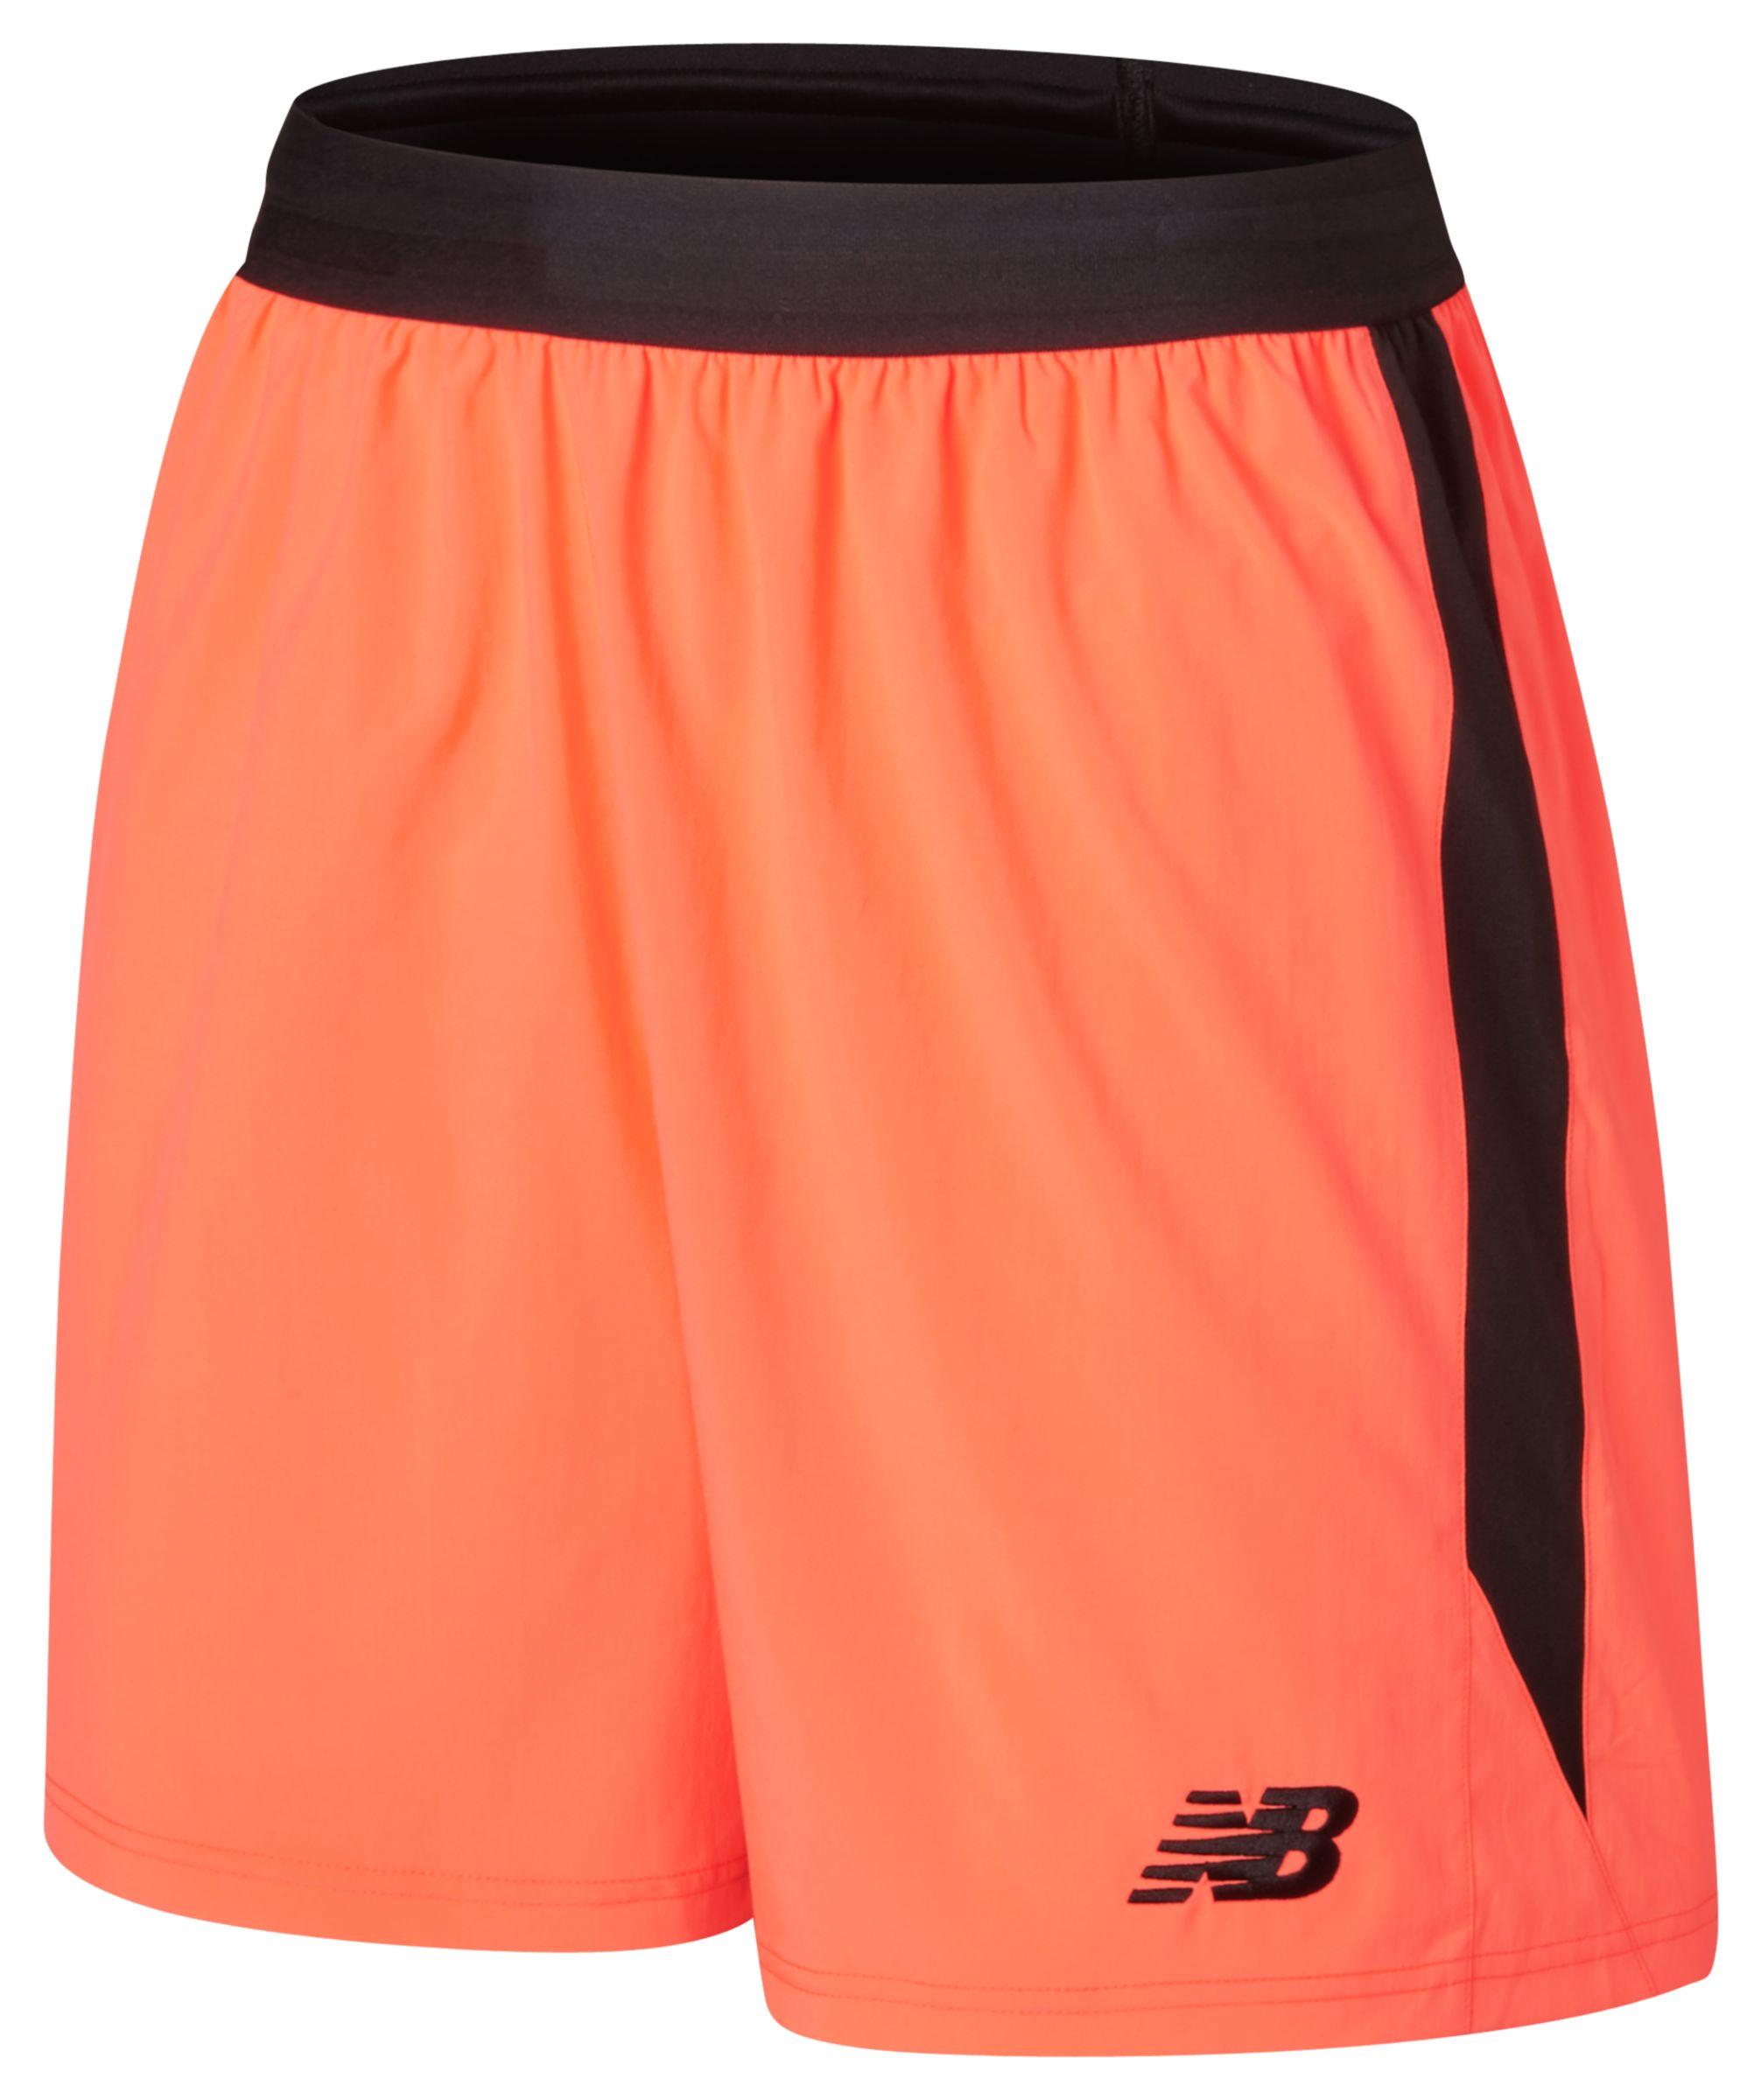 NB LFC 3Rd Short -  Jonk, Bold Citrus